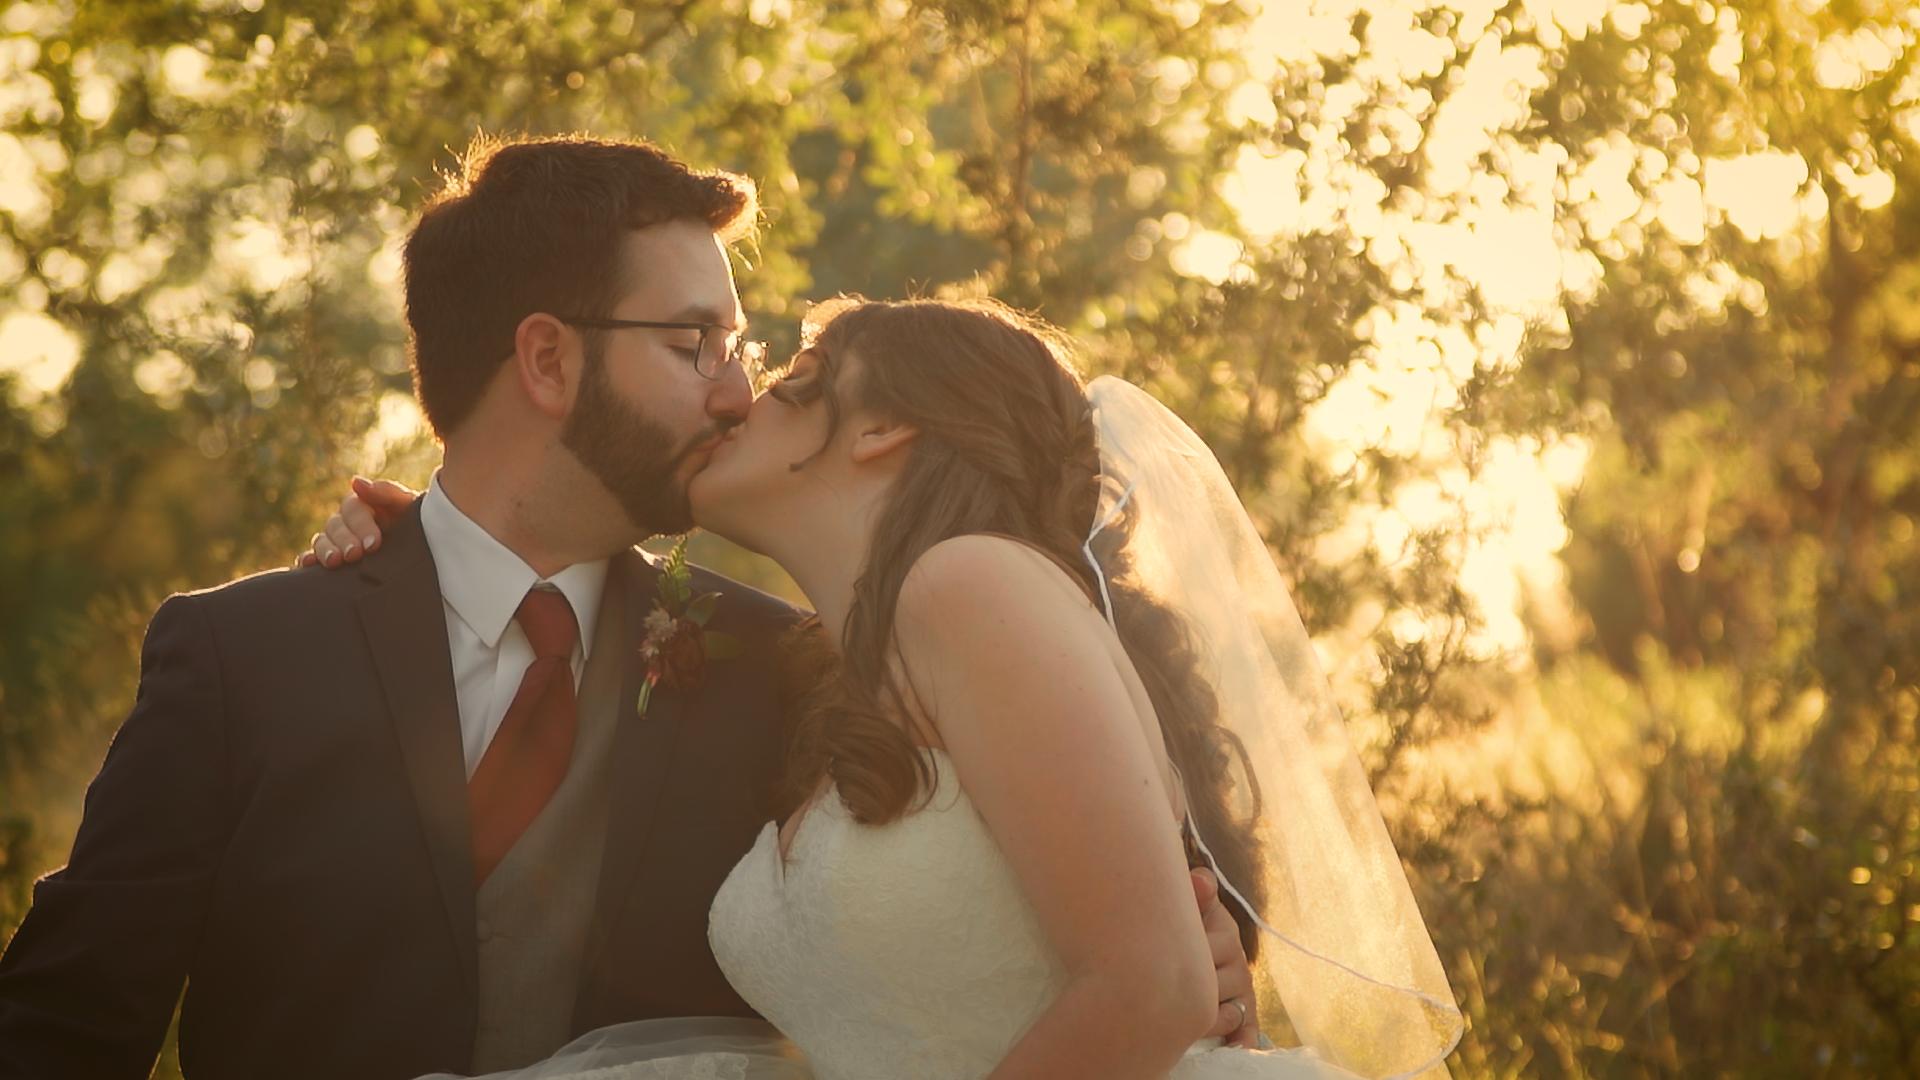 Rebecca_and_Daniel_Wedding_Austin_Texas_Vista_West_Ranch24.png